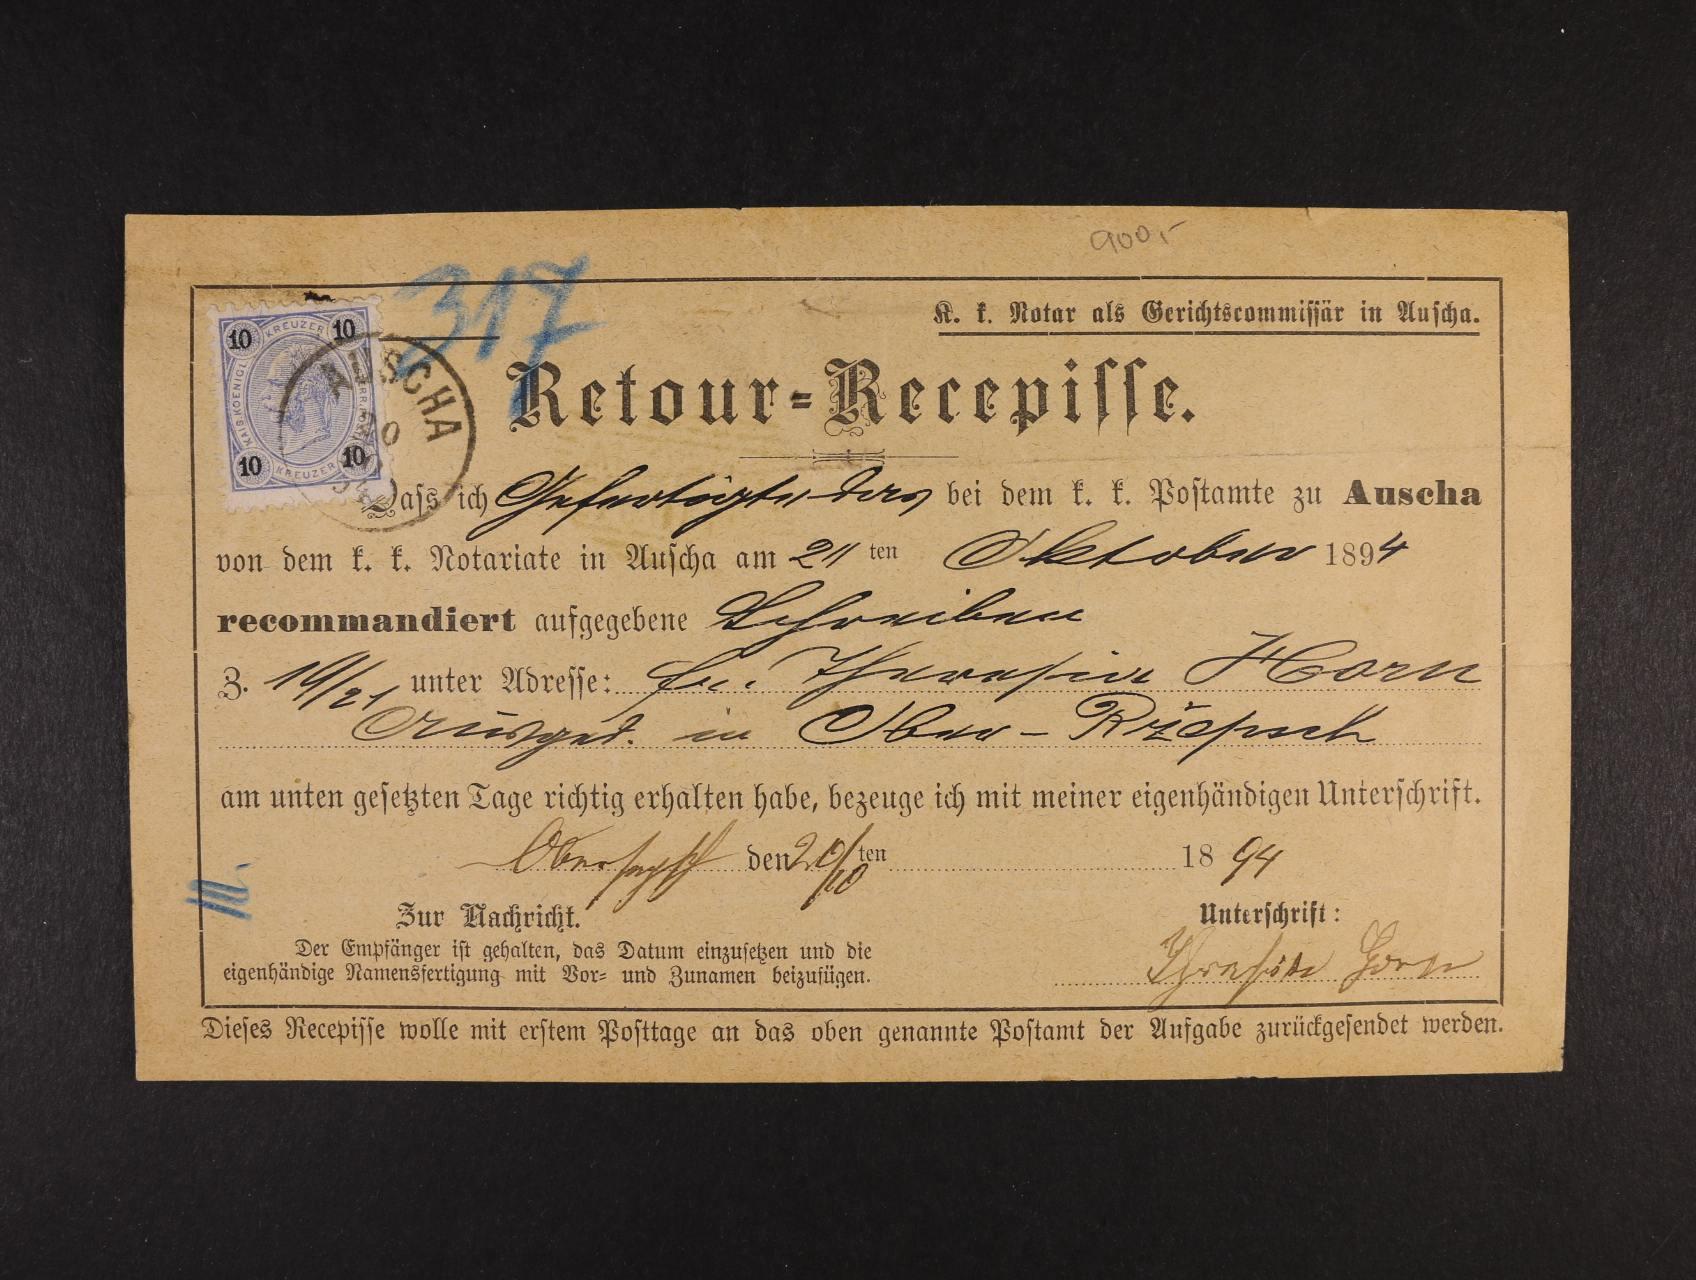 tiskopis Retour=Recepisse z r. 1894 frank. zn. 10kr F.J., pod. raz. AUSCHA 20.10.1894, dobrá kvalita